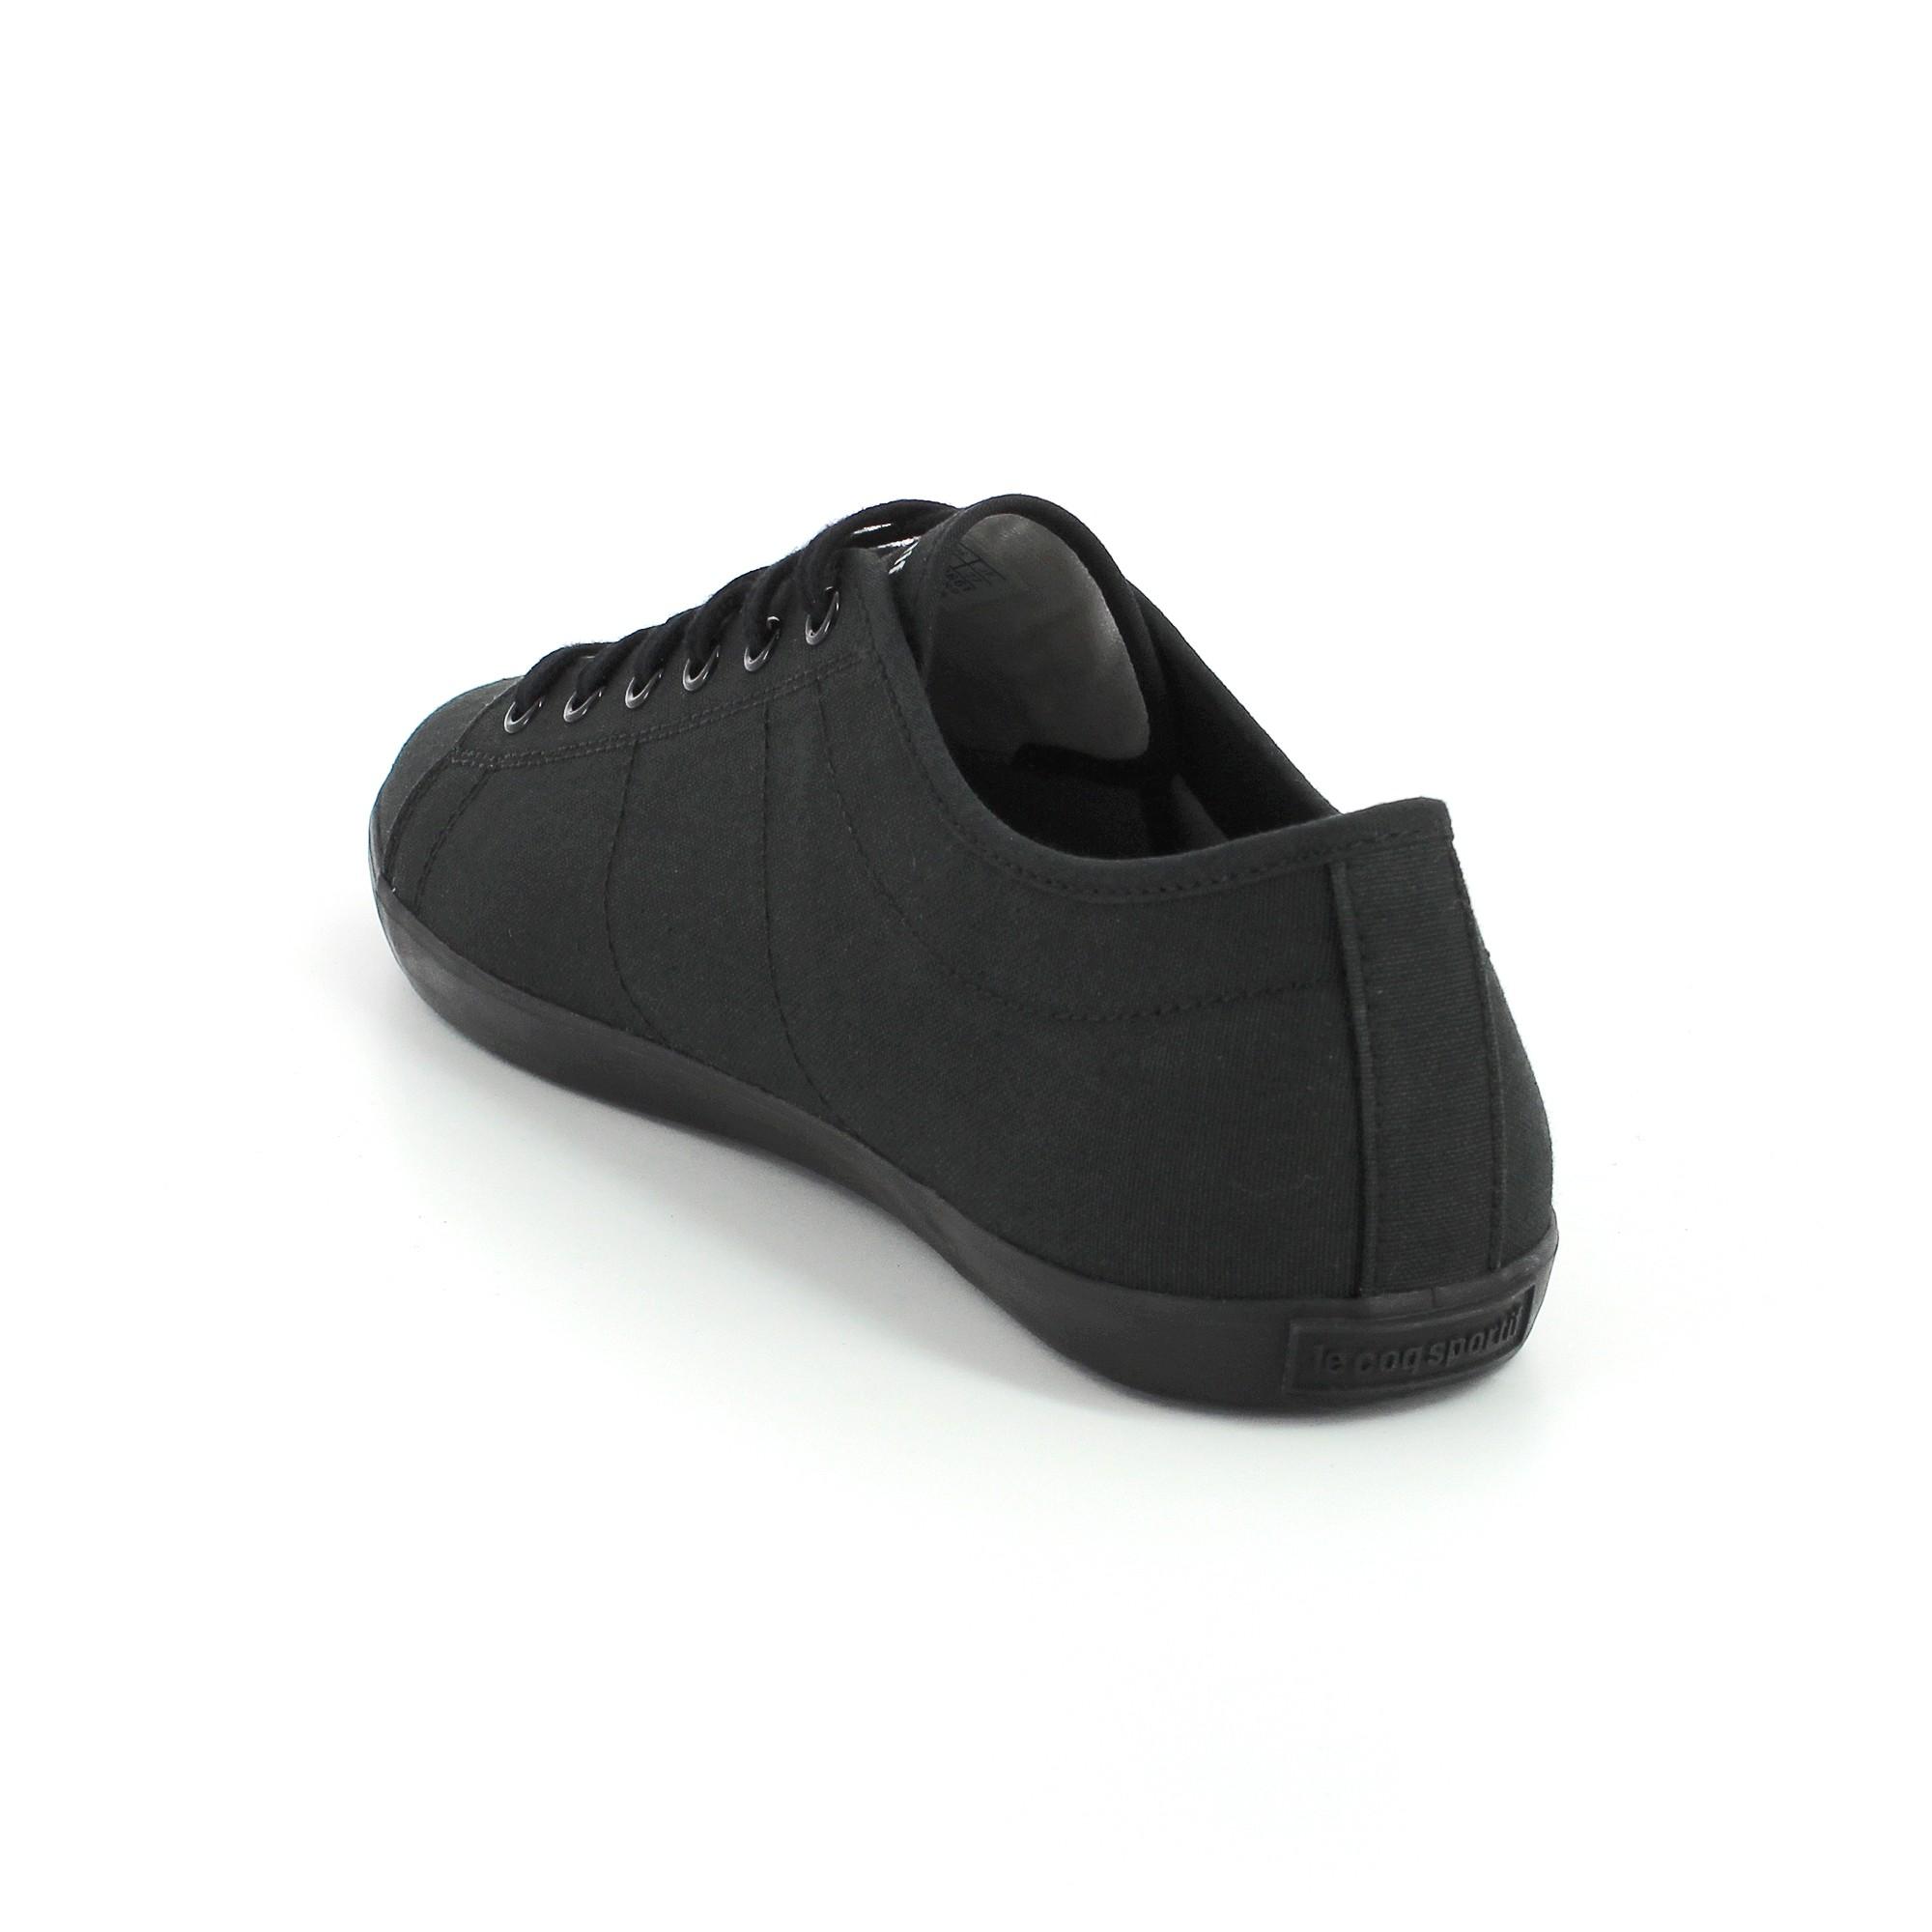 b6d2ef347fe7 sneakers sneakers le coq sportif slimset cvs triple black ...